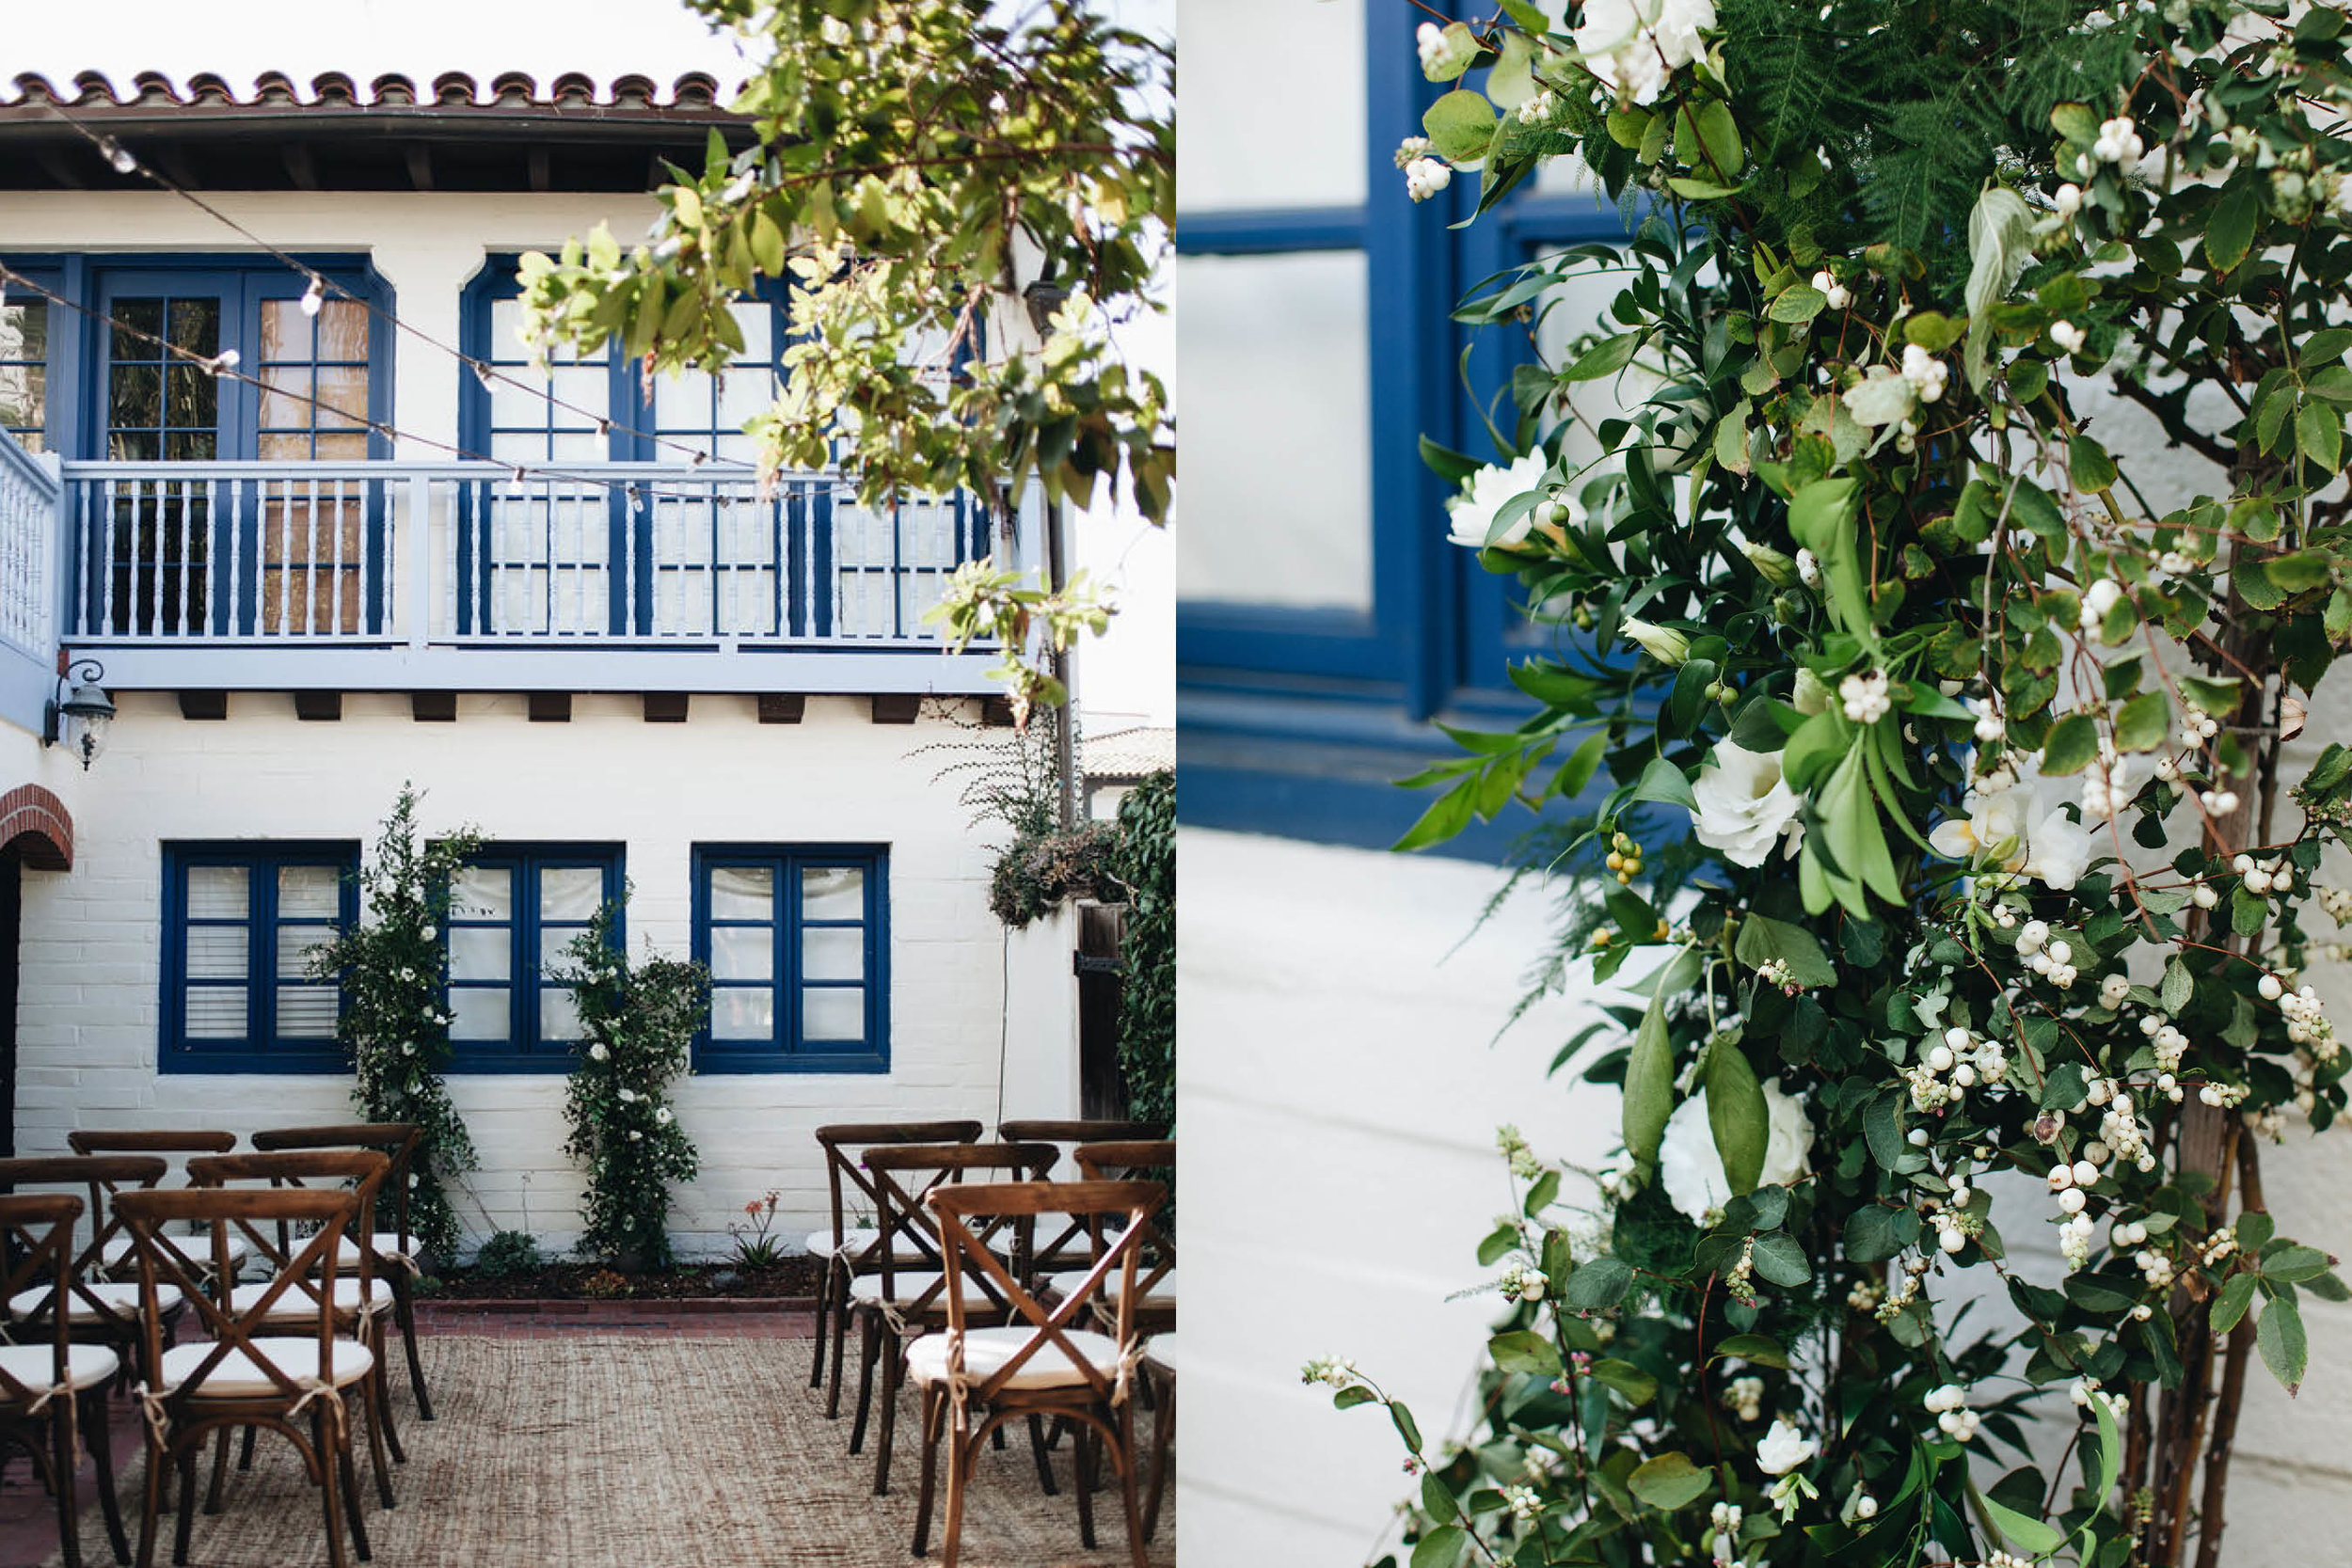 santa-barbara-elopement-wedding-planner-planning-coordination-day-of-coordinator-downtown-garden-oasis-float-spa-fountain-blue-white-event-design-vintage-china (14).jpg